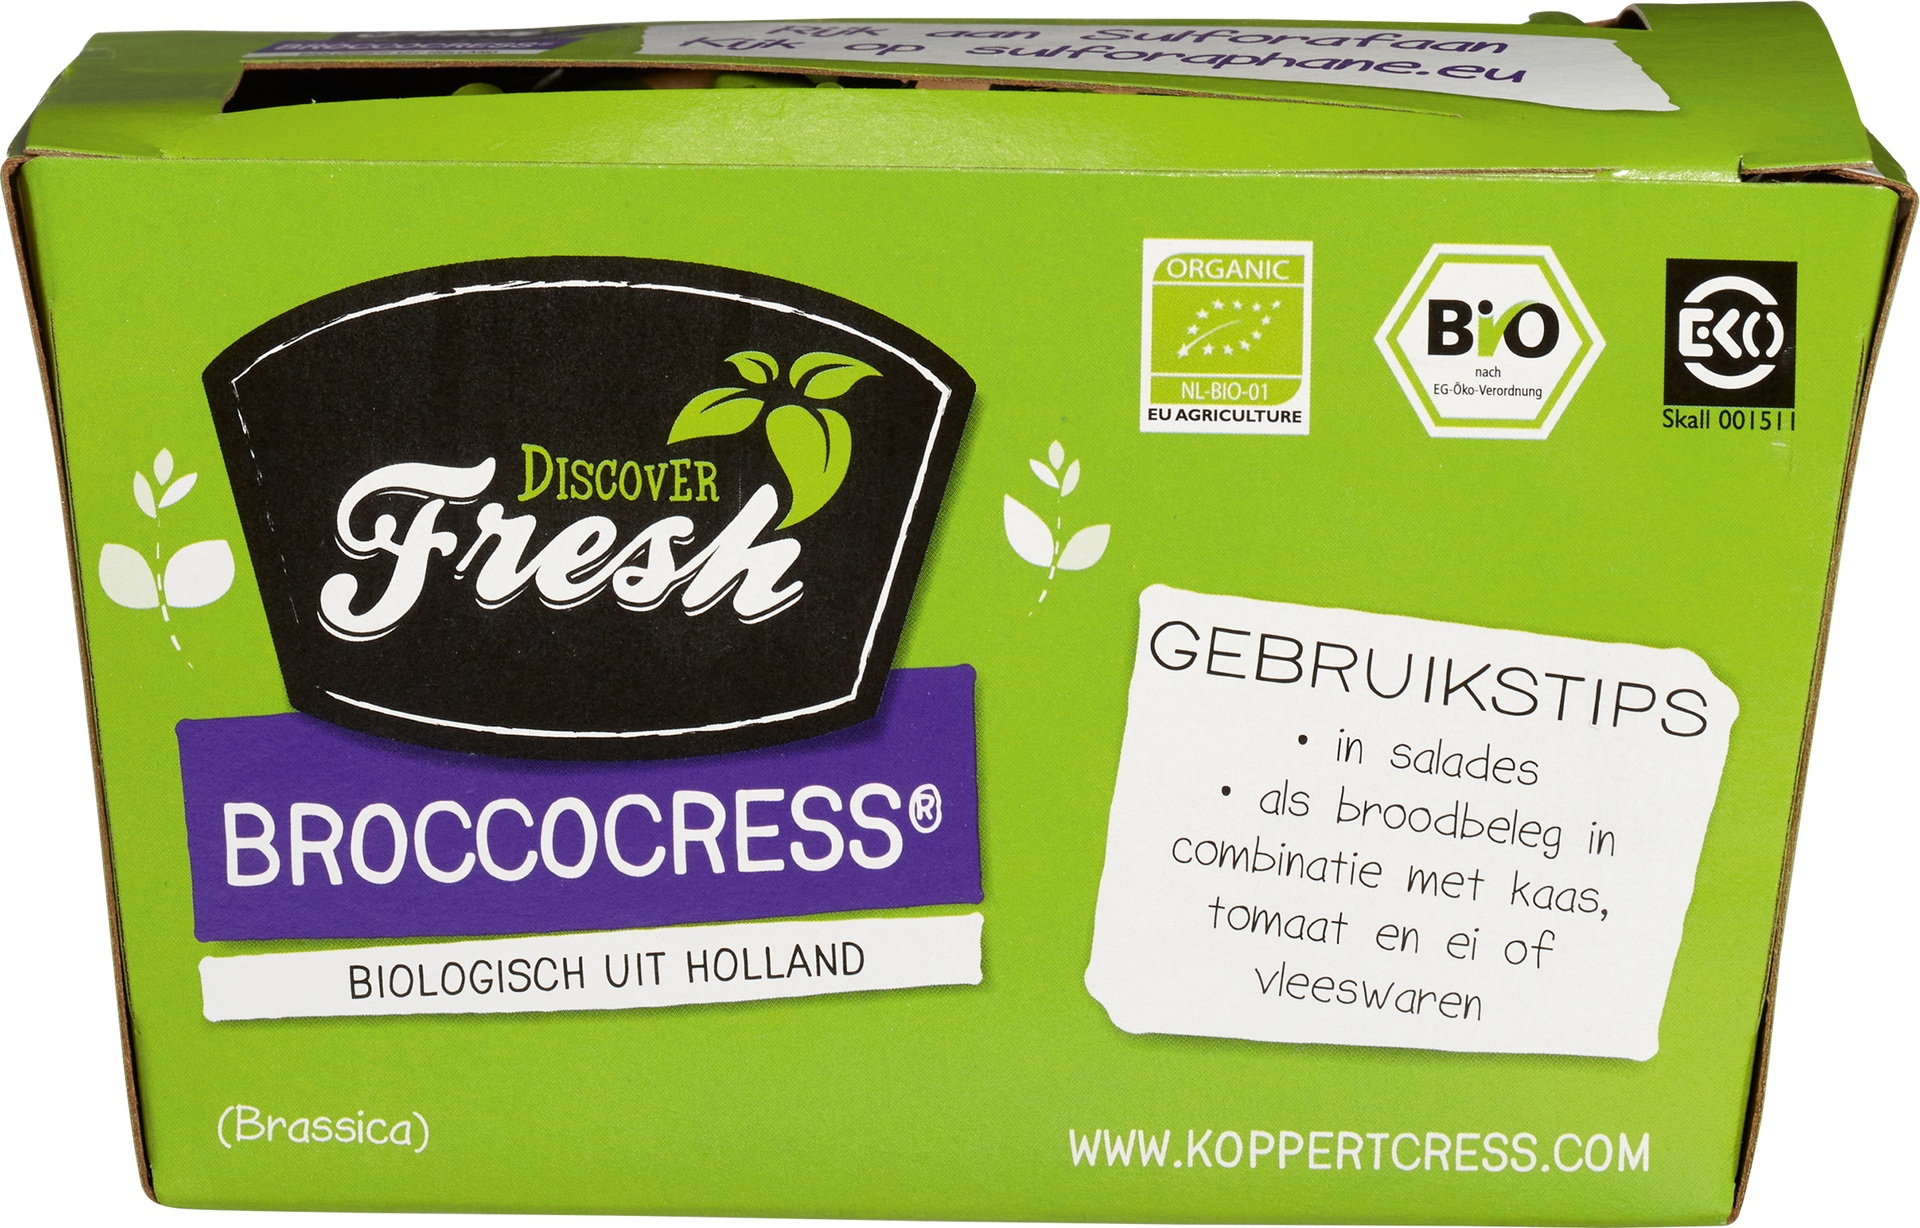 Biologische Discover Fresh BroccoCress (10) 130 gr